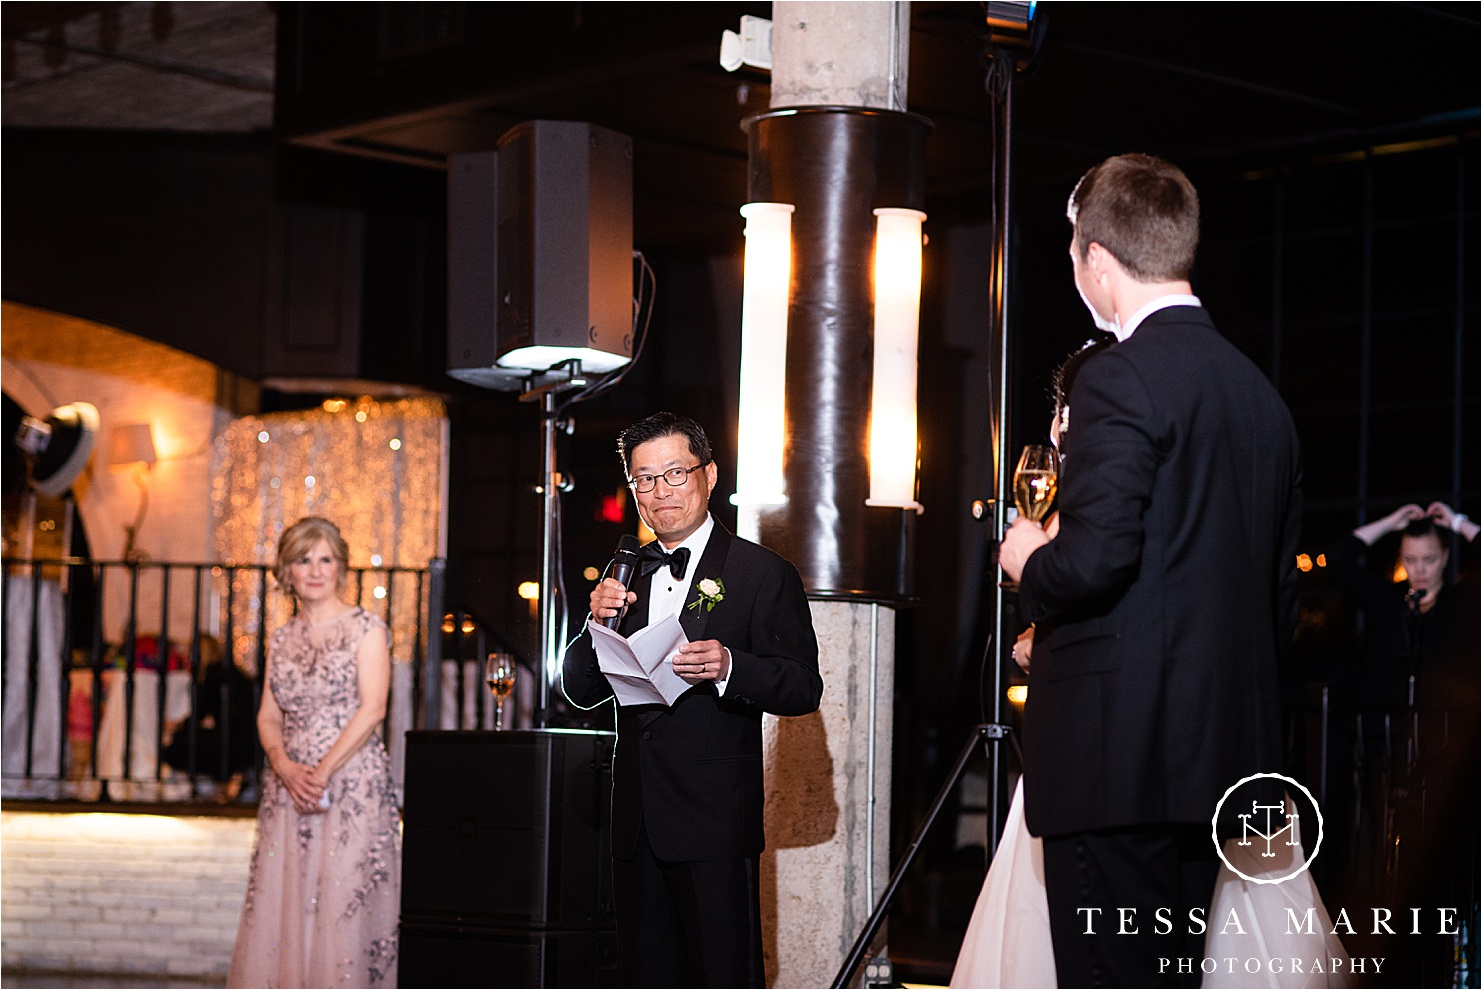 Tessa_marie_weddings_houston_wedding_photographer_The_astorian_0163.jpg